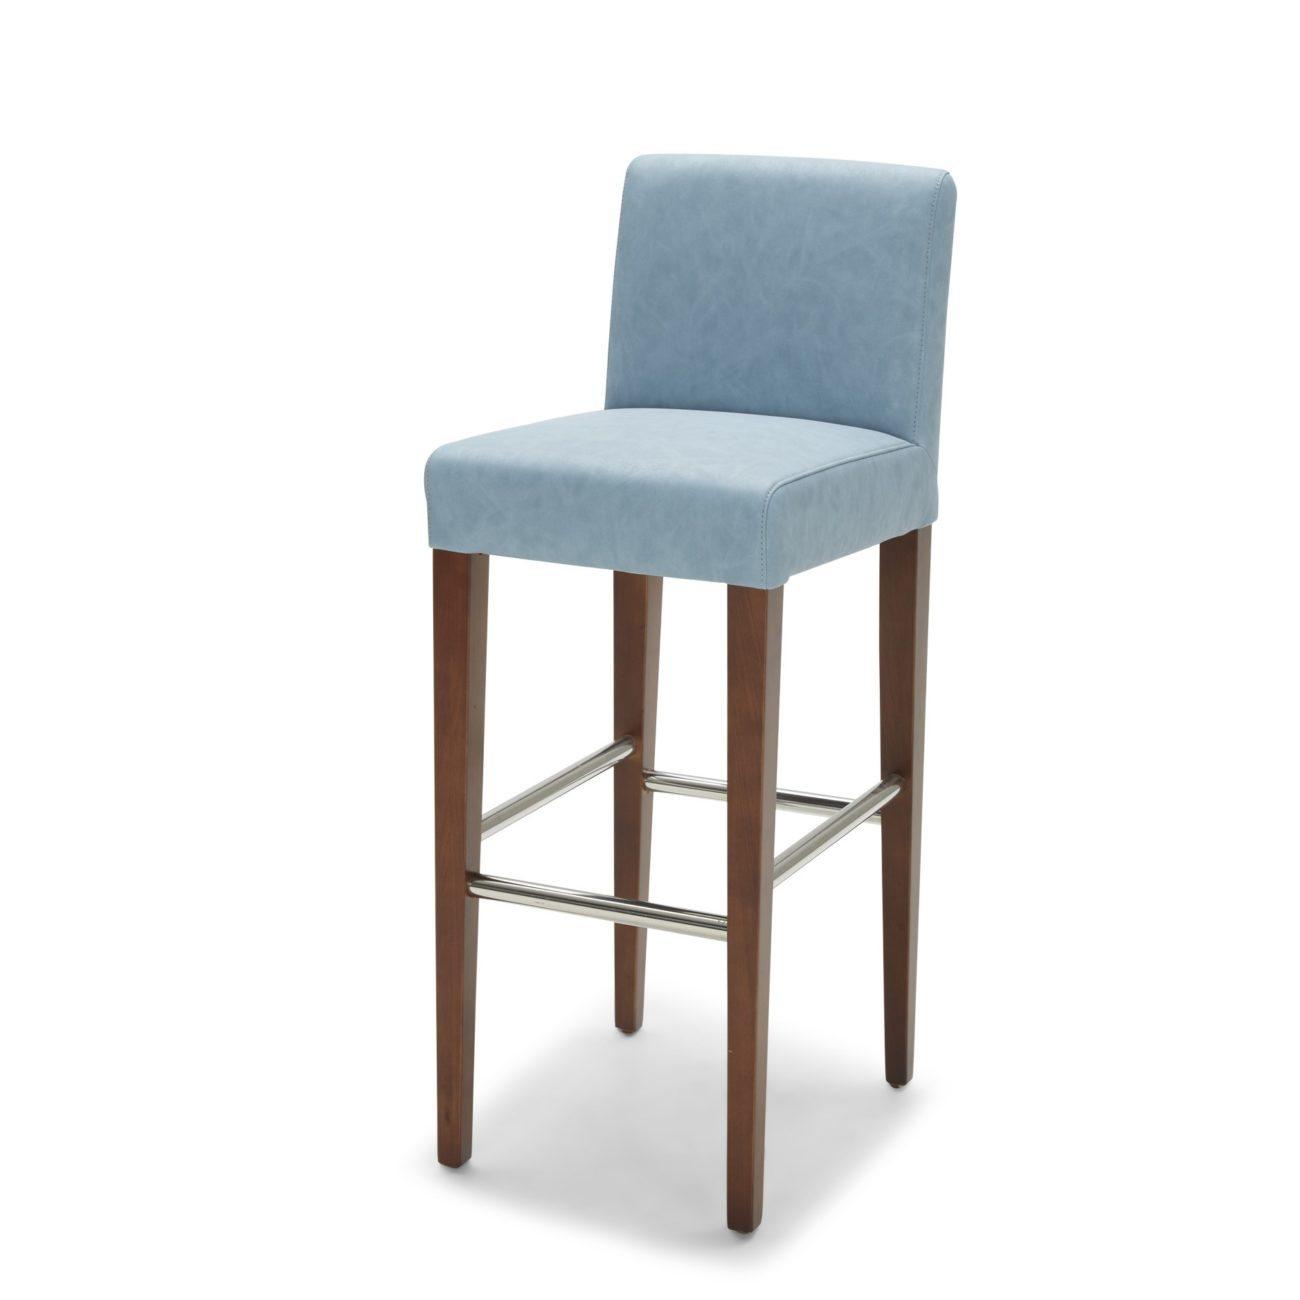 Siena Barstool Horizon Home Furniture : edit pic 5 Y 180jpgModified from horizonhomefurniture.net size 1300 x 1300 jpeg 49kB